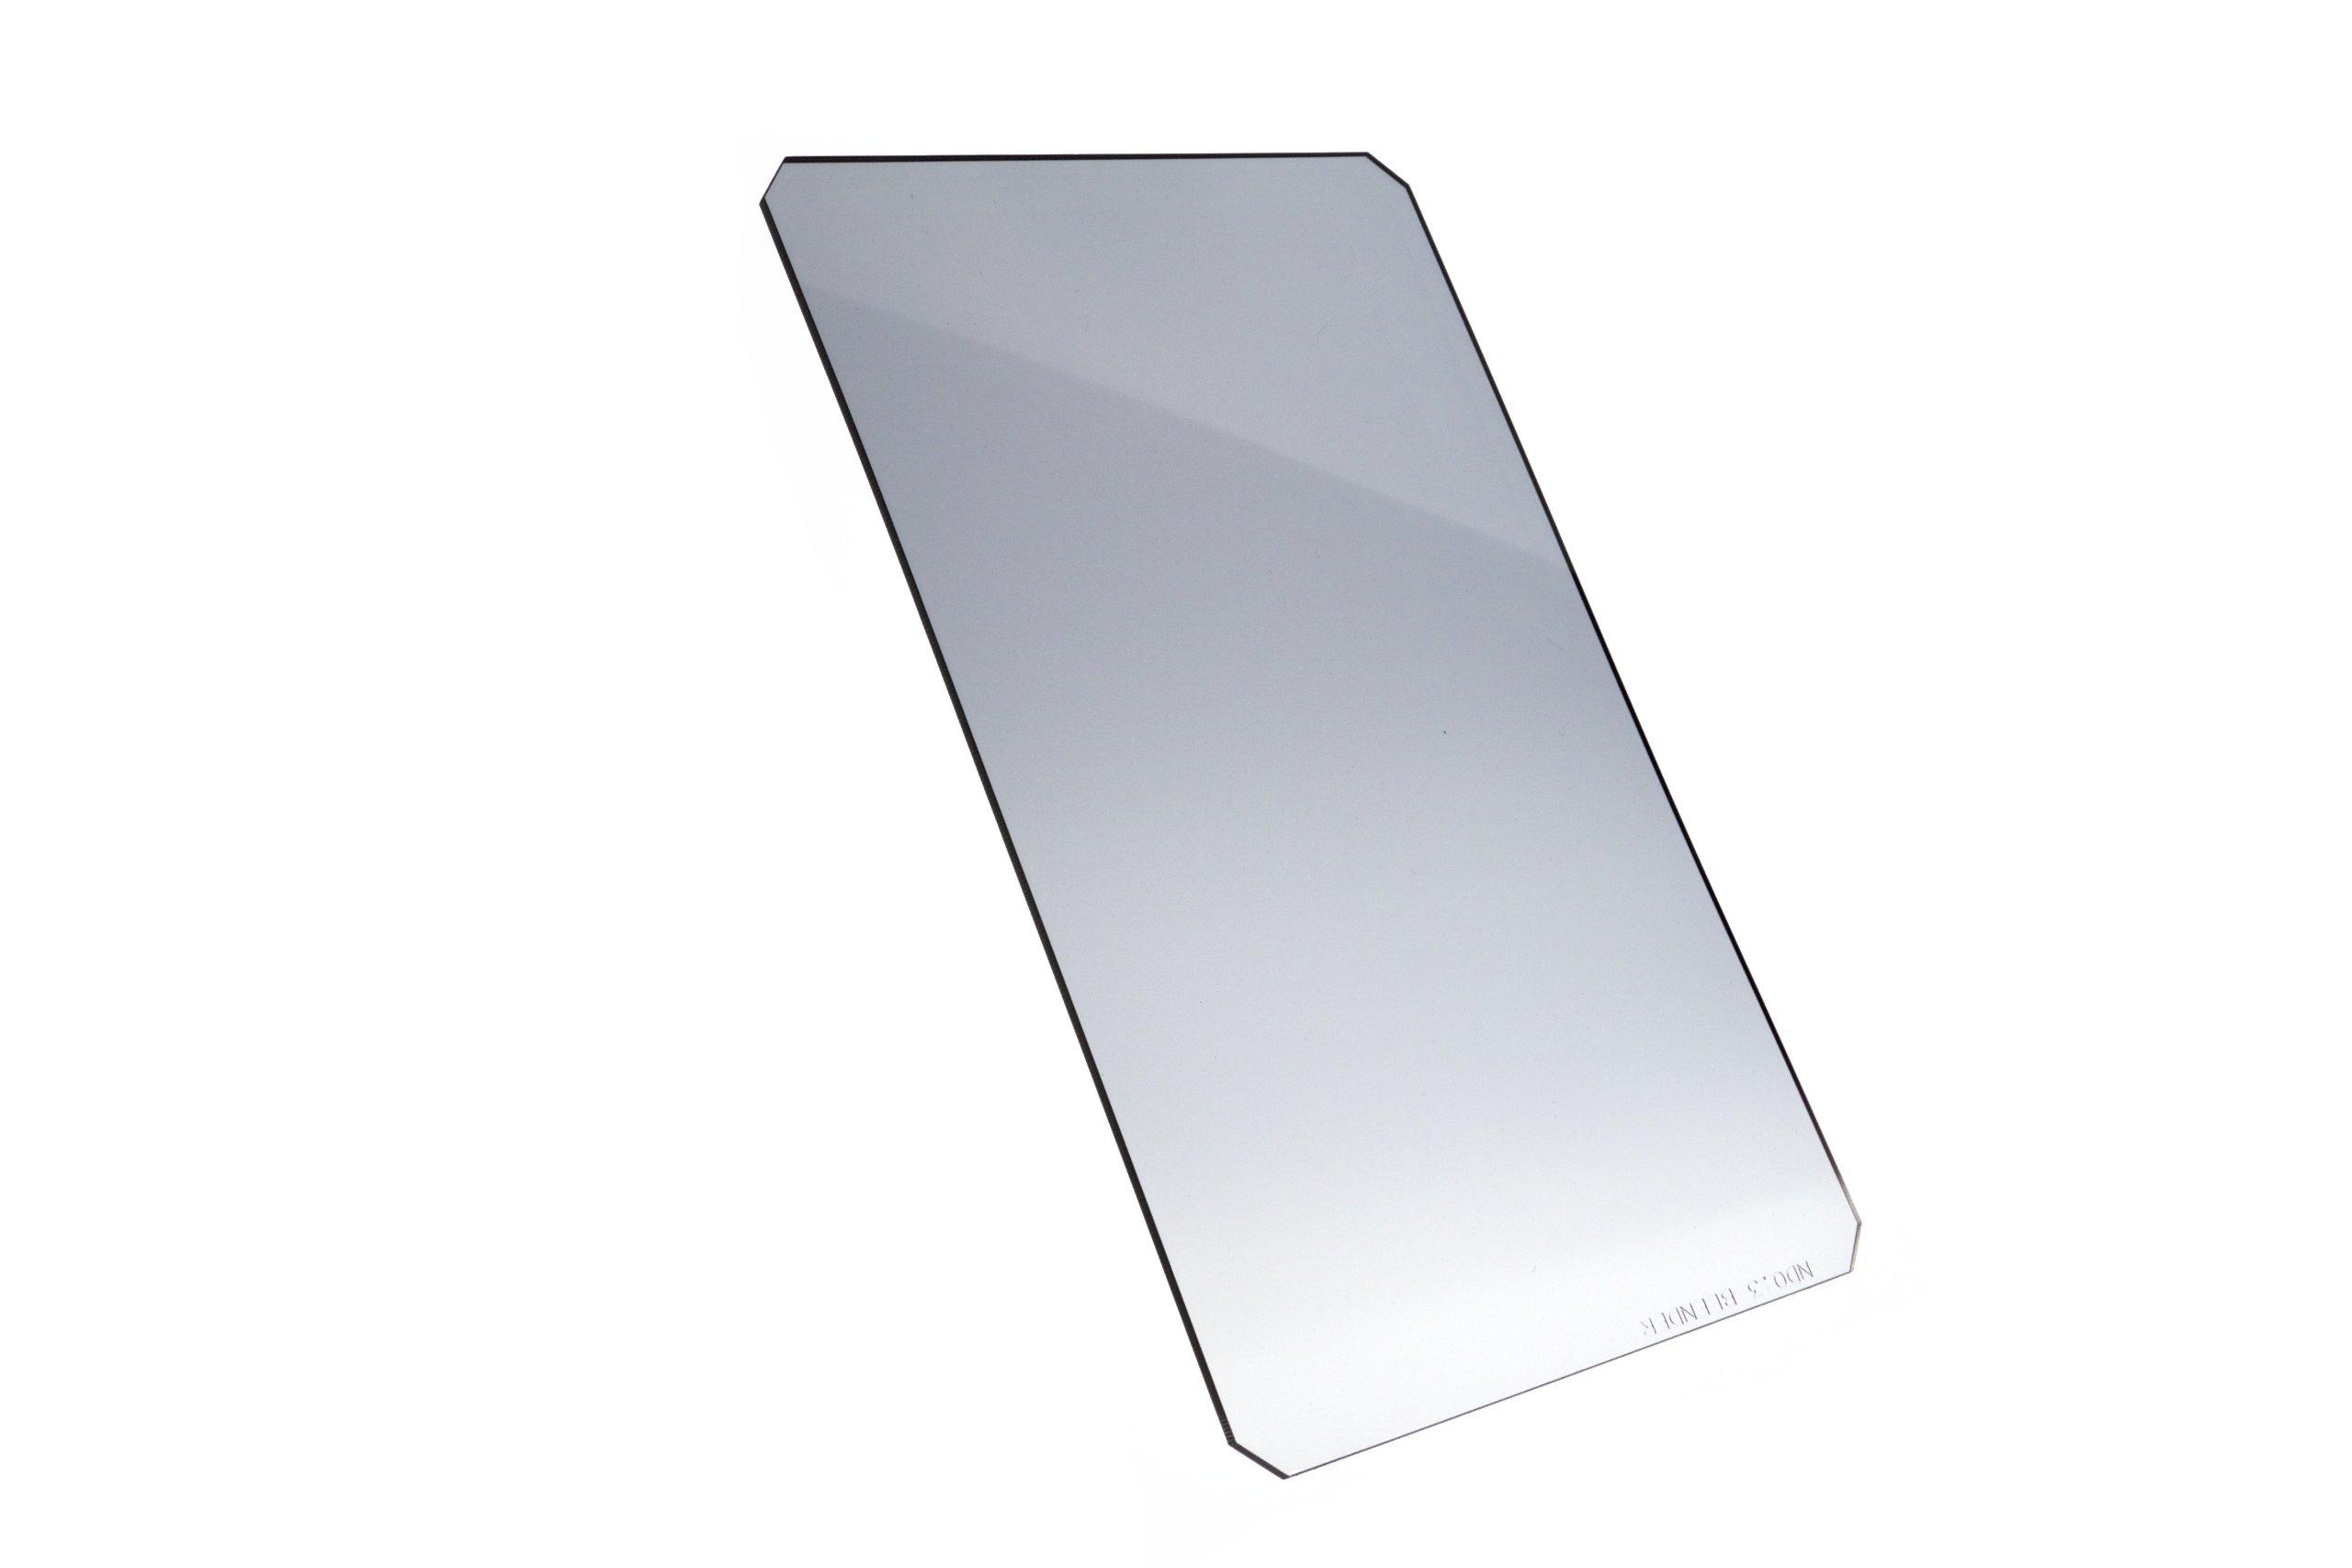 100x150mm Resin Neutral Density Blender 0.3 (1 Stop) by Formatt Hitech Limited